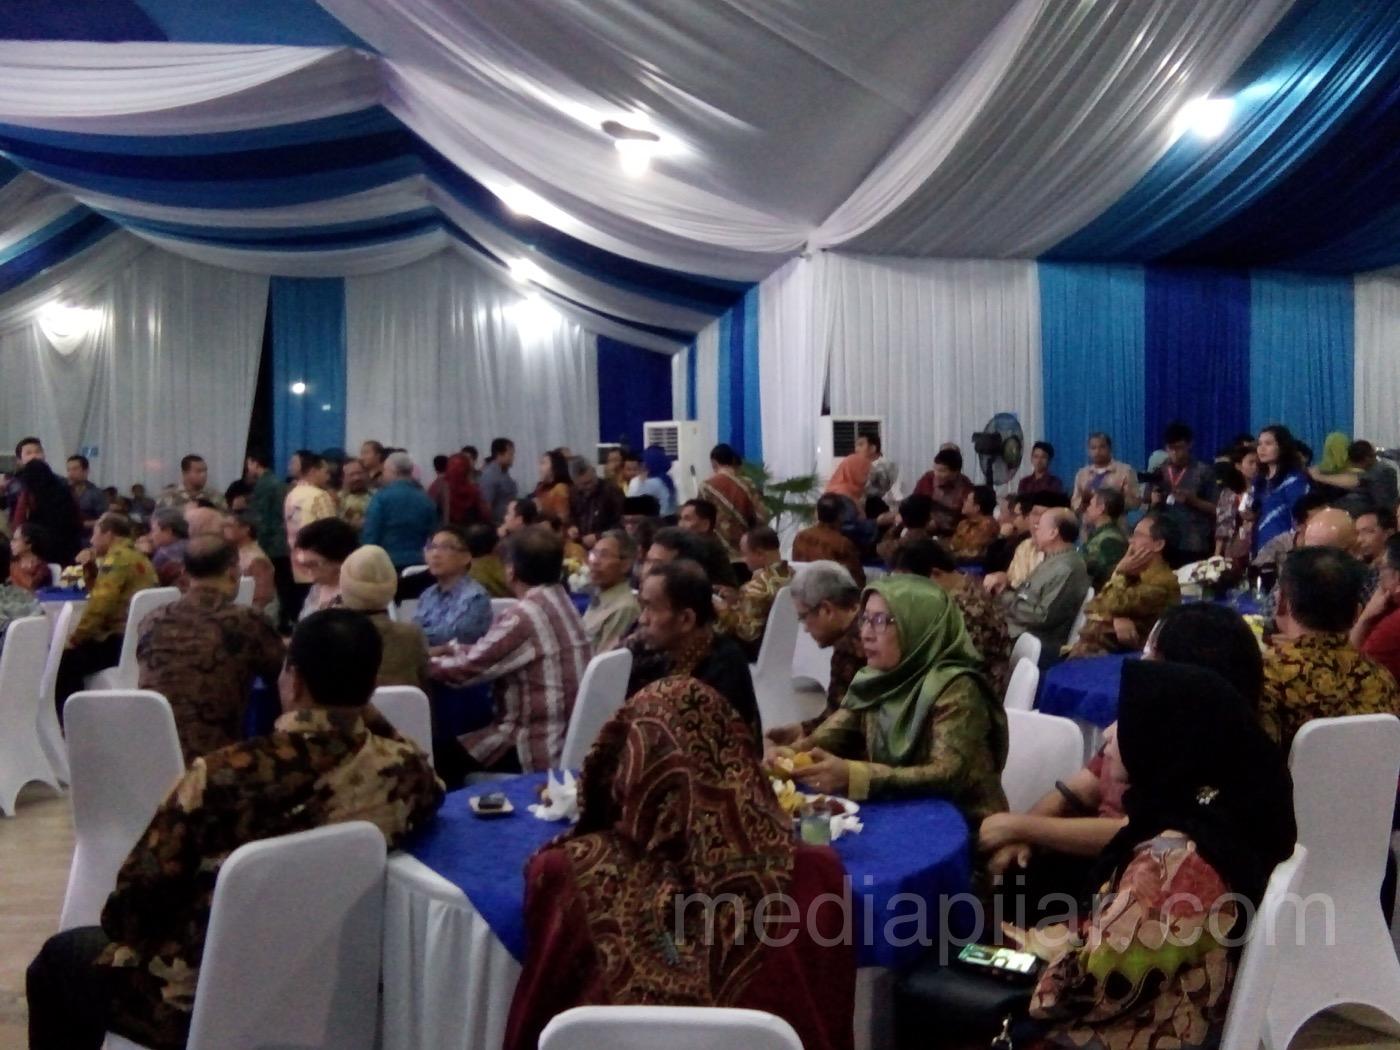 Suasana pada saat acara galadinner rakernas di Gedung Pancasila USU (16/01) (Fotografer: Novita Arum)